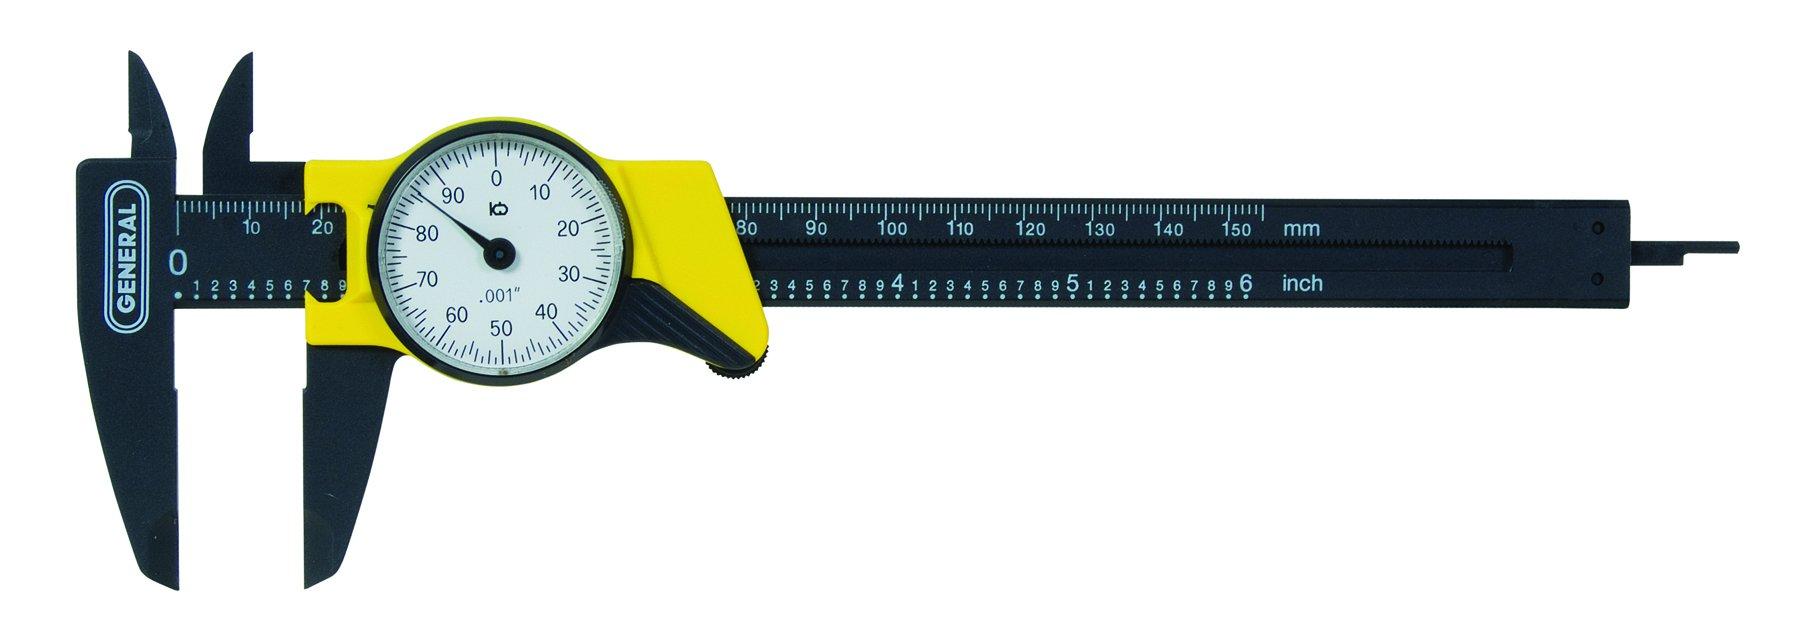 General Tools 145 6-Inch Plastic Dial Caliper, Thousandths Reading